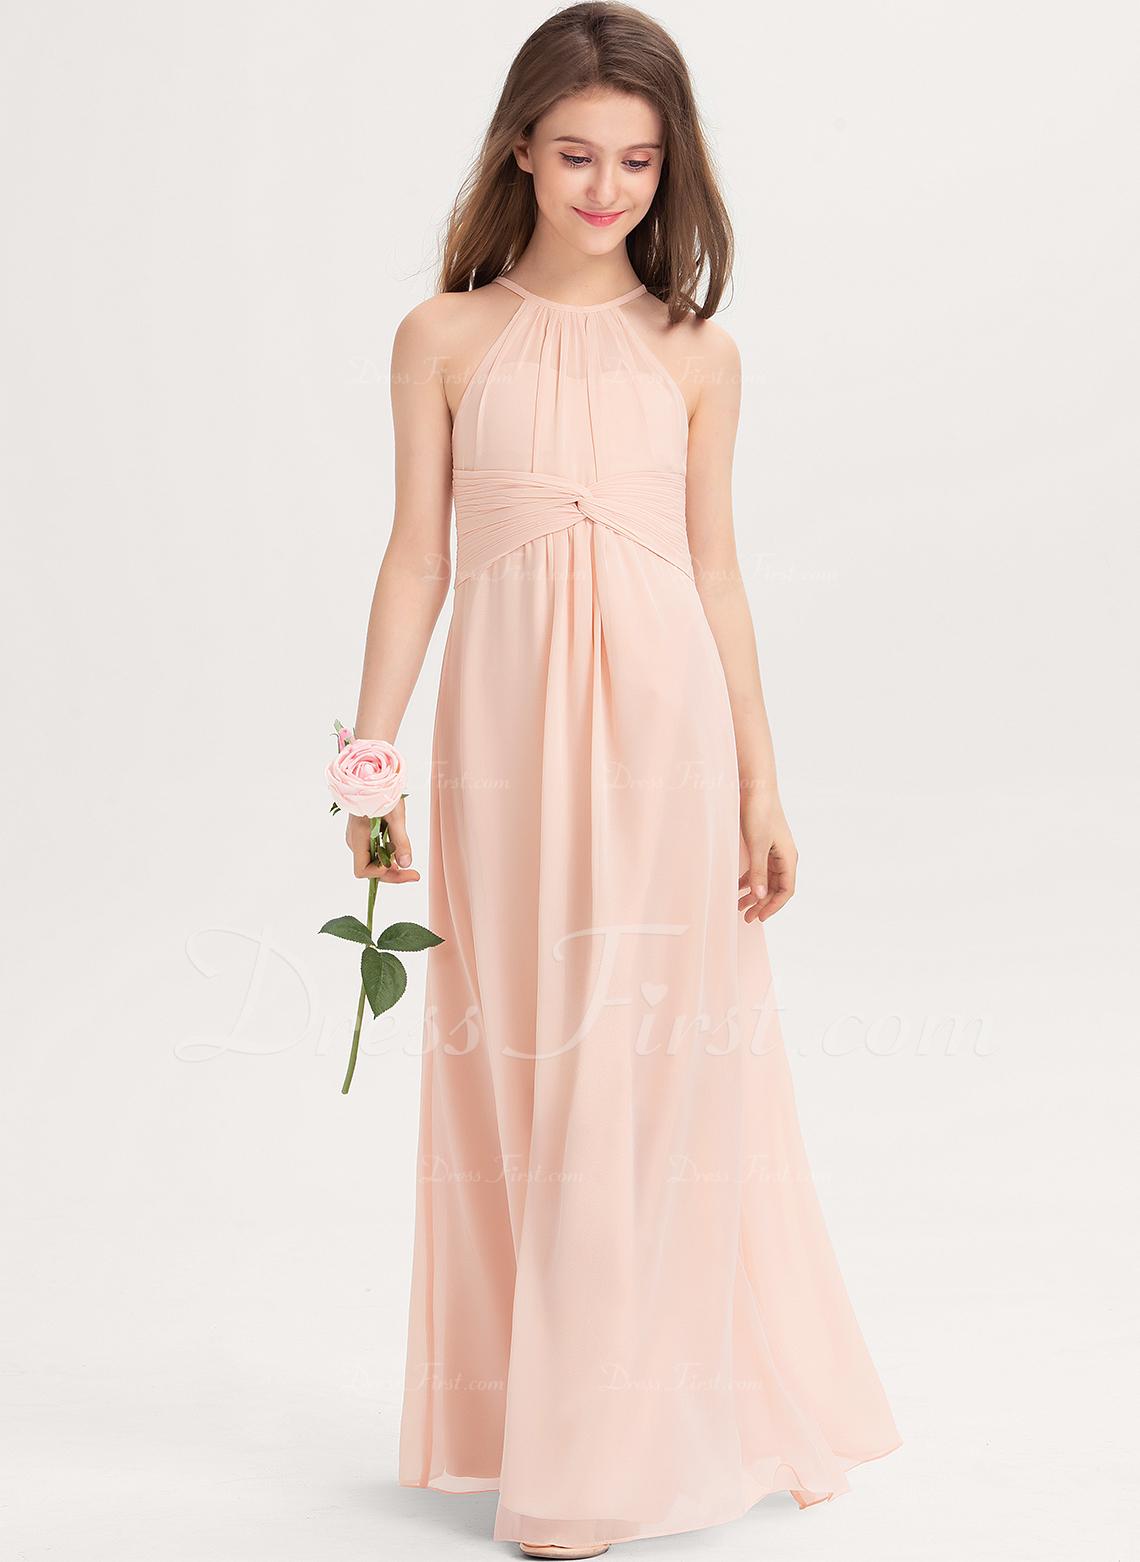 A-Line Scoop Neck Floor-Length Chiffon Junior Bridesmaid Dress With Ruffle